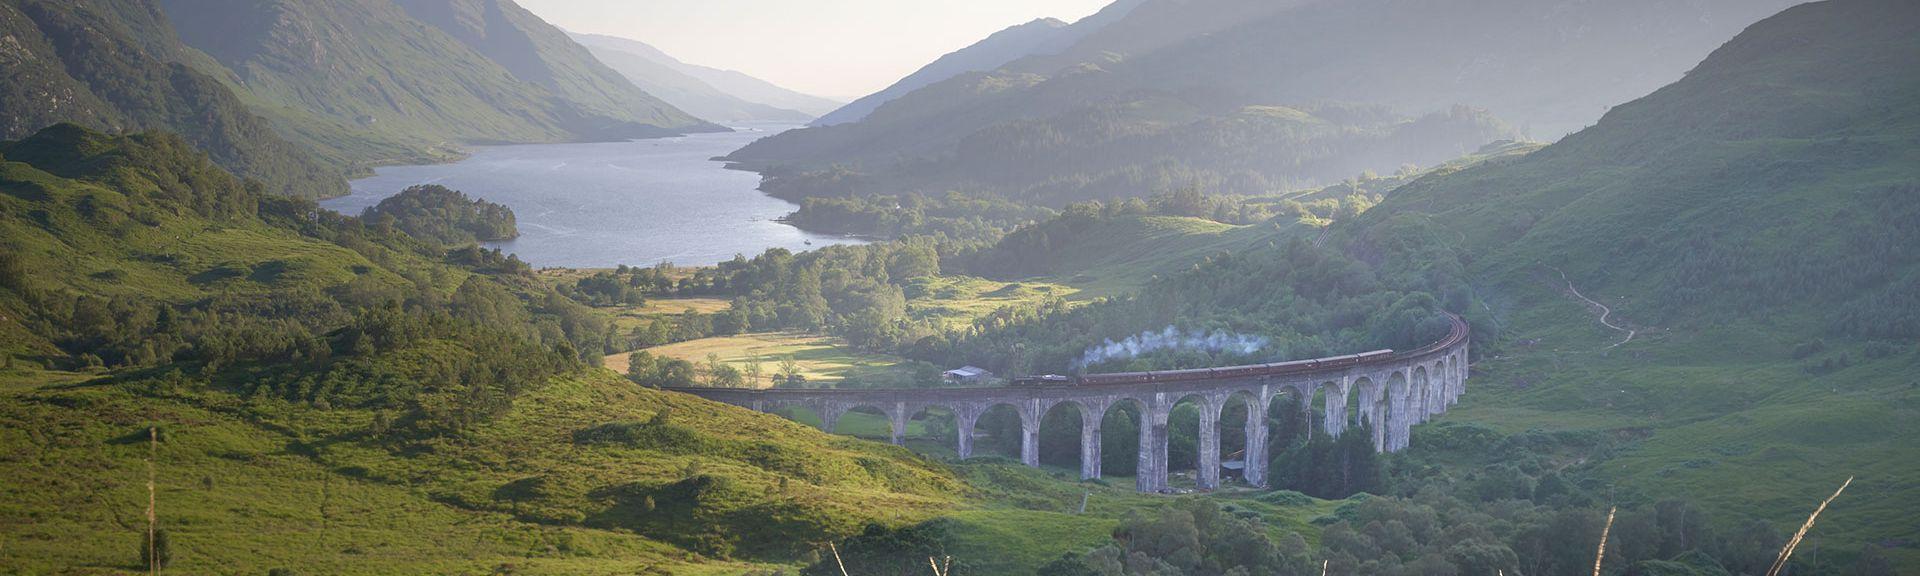 Glenfinnan Viaduct